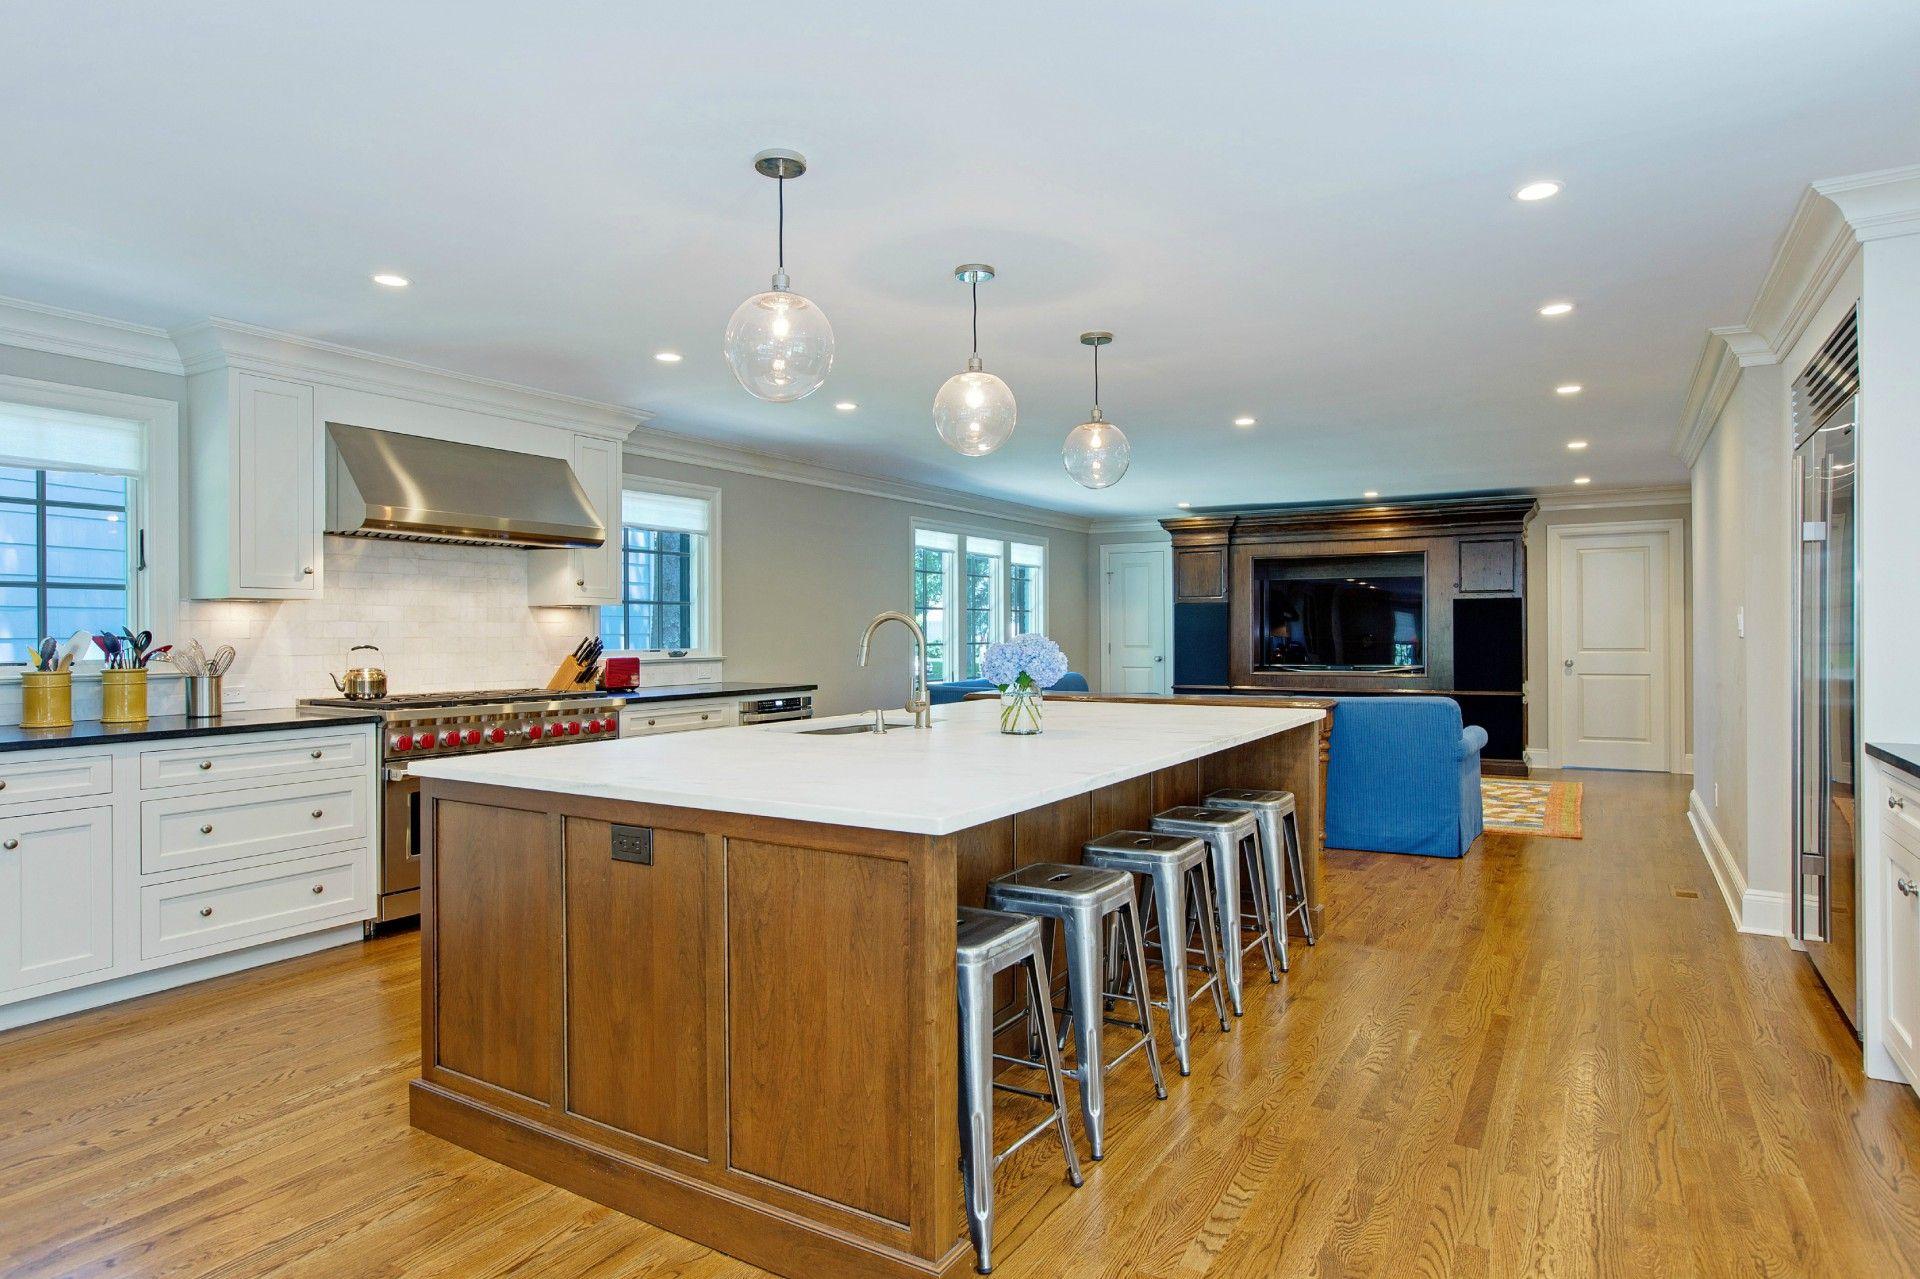 Transitional Interior Renovation / Addition (Munsey Park, NY) - Full ...